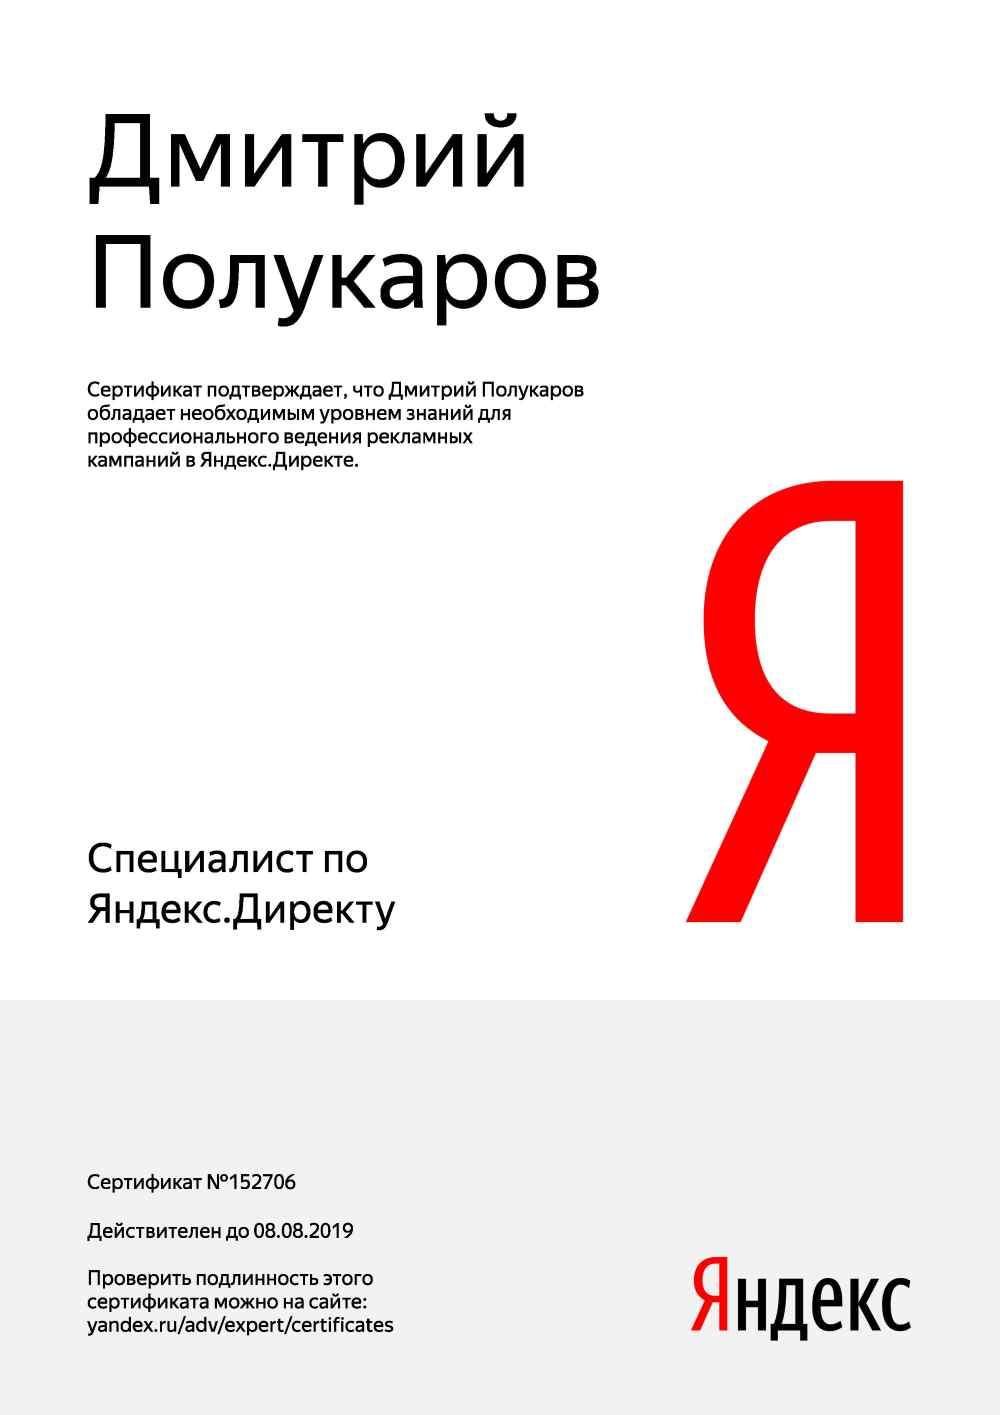 Наш сертификат по Яндекс Директ